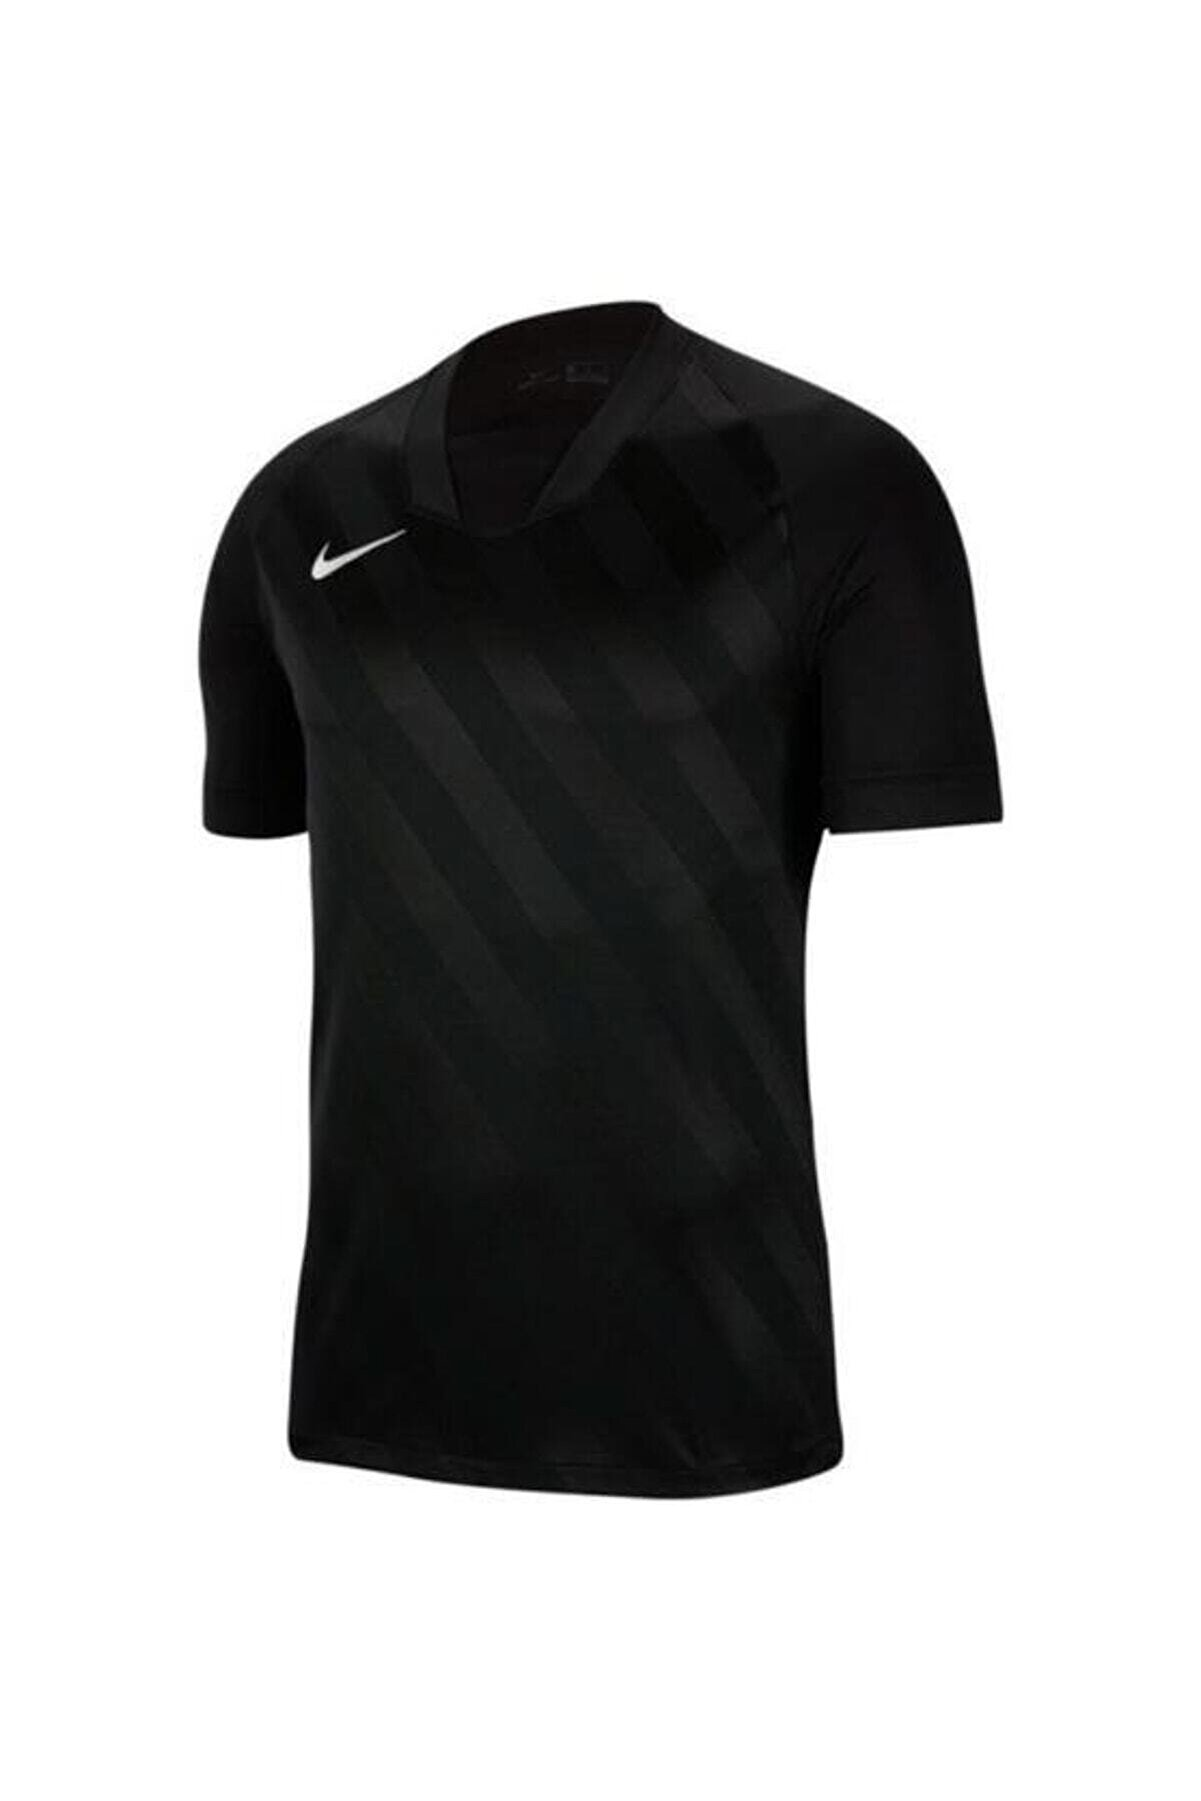 Nike Dry Jersey Challenge III BV6703-010 Erkek Forma